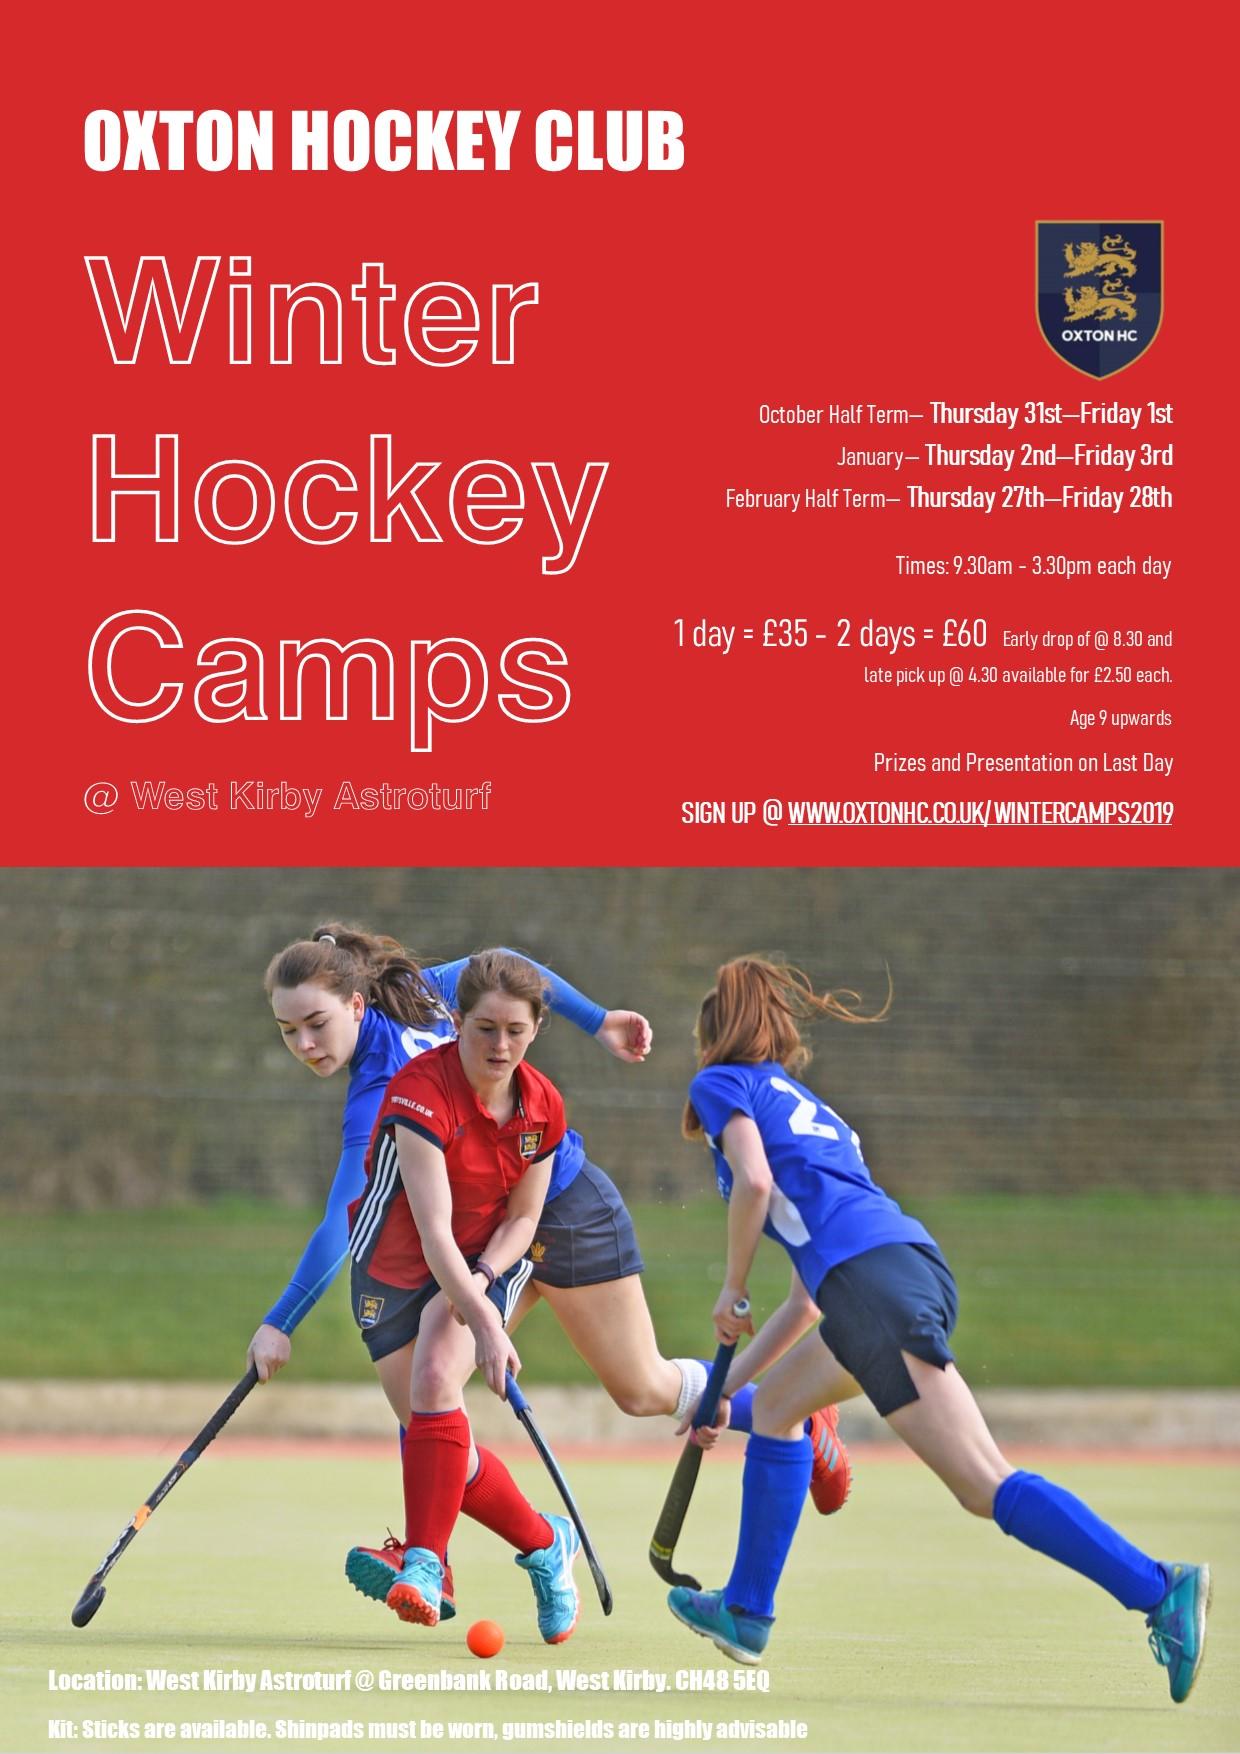 Oxton HC Winter Hockey Camps